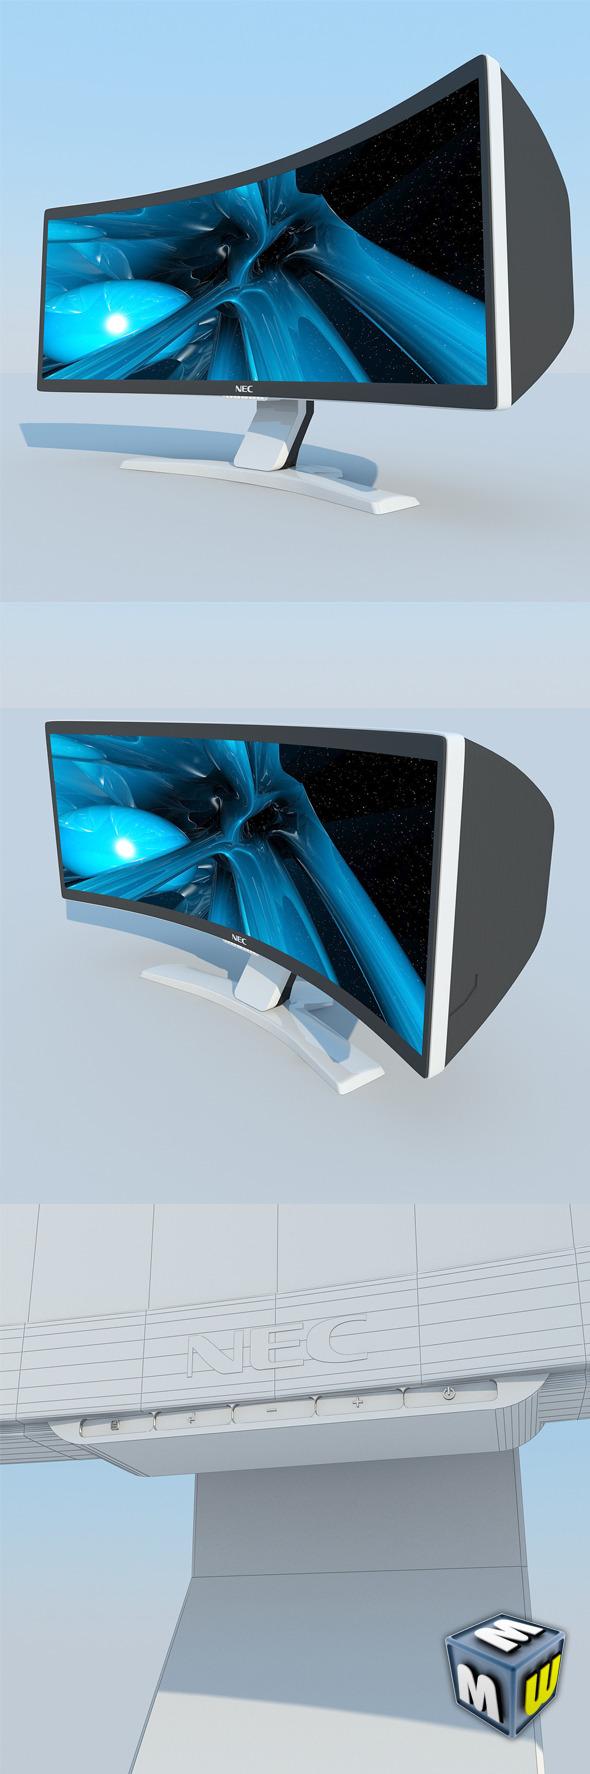 NEC CRV43 LCD Display MAX 2011 - 3DOcean Item for Sale